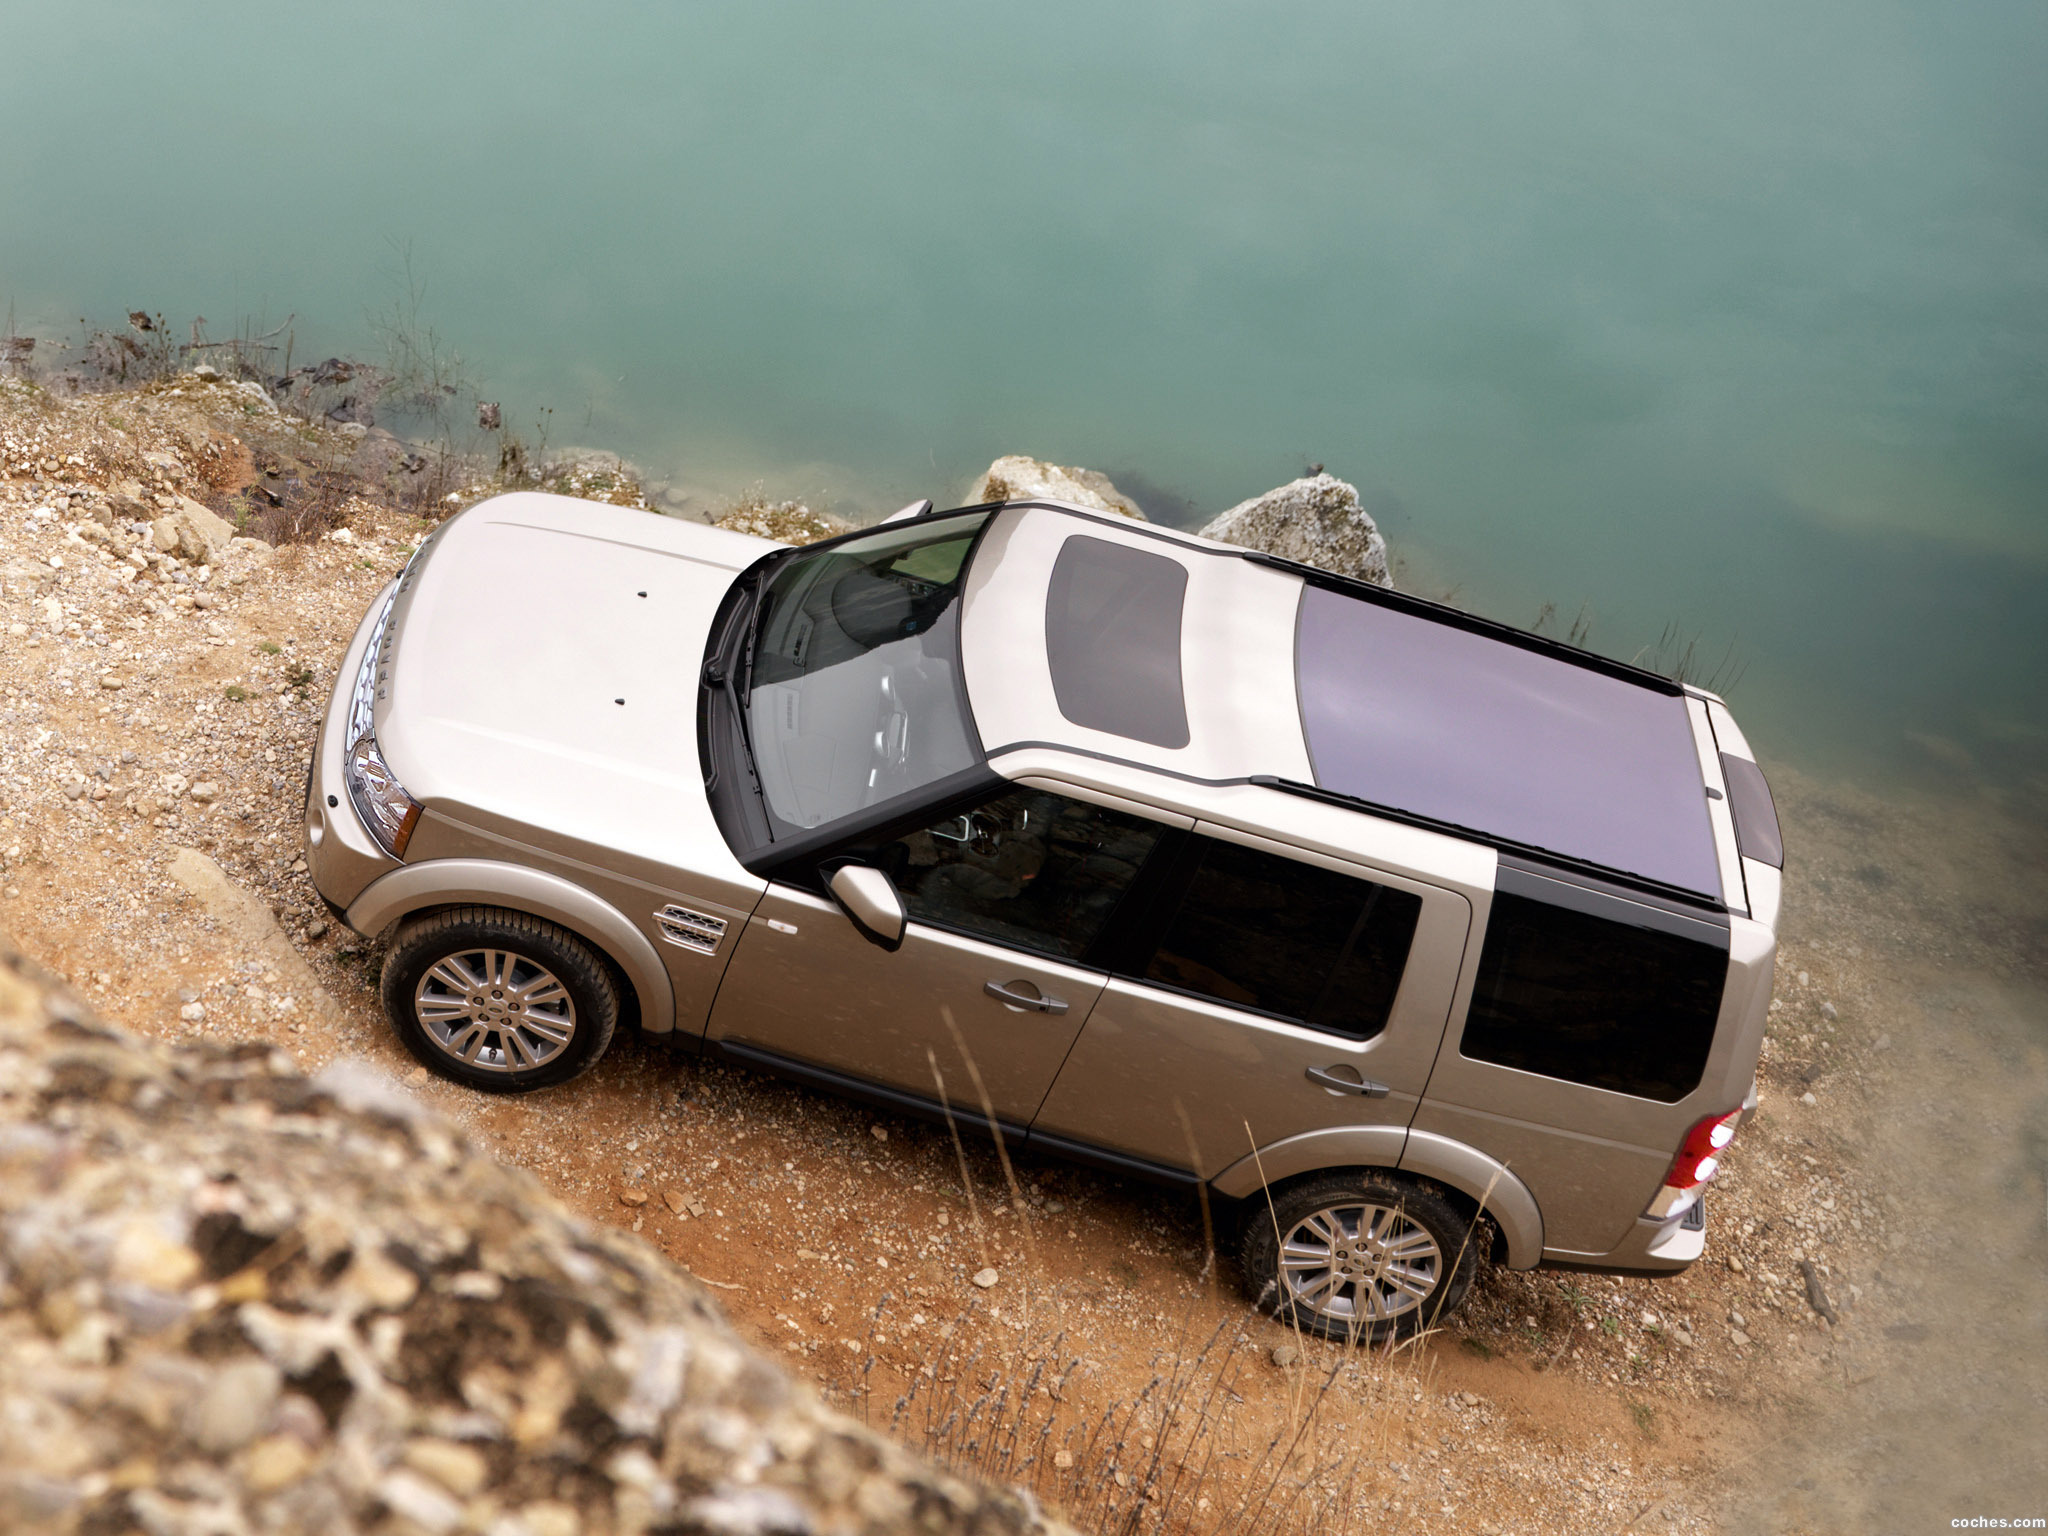 Foto 2 de Land Rover Discovery 4 3.0 TDV6 2009